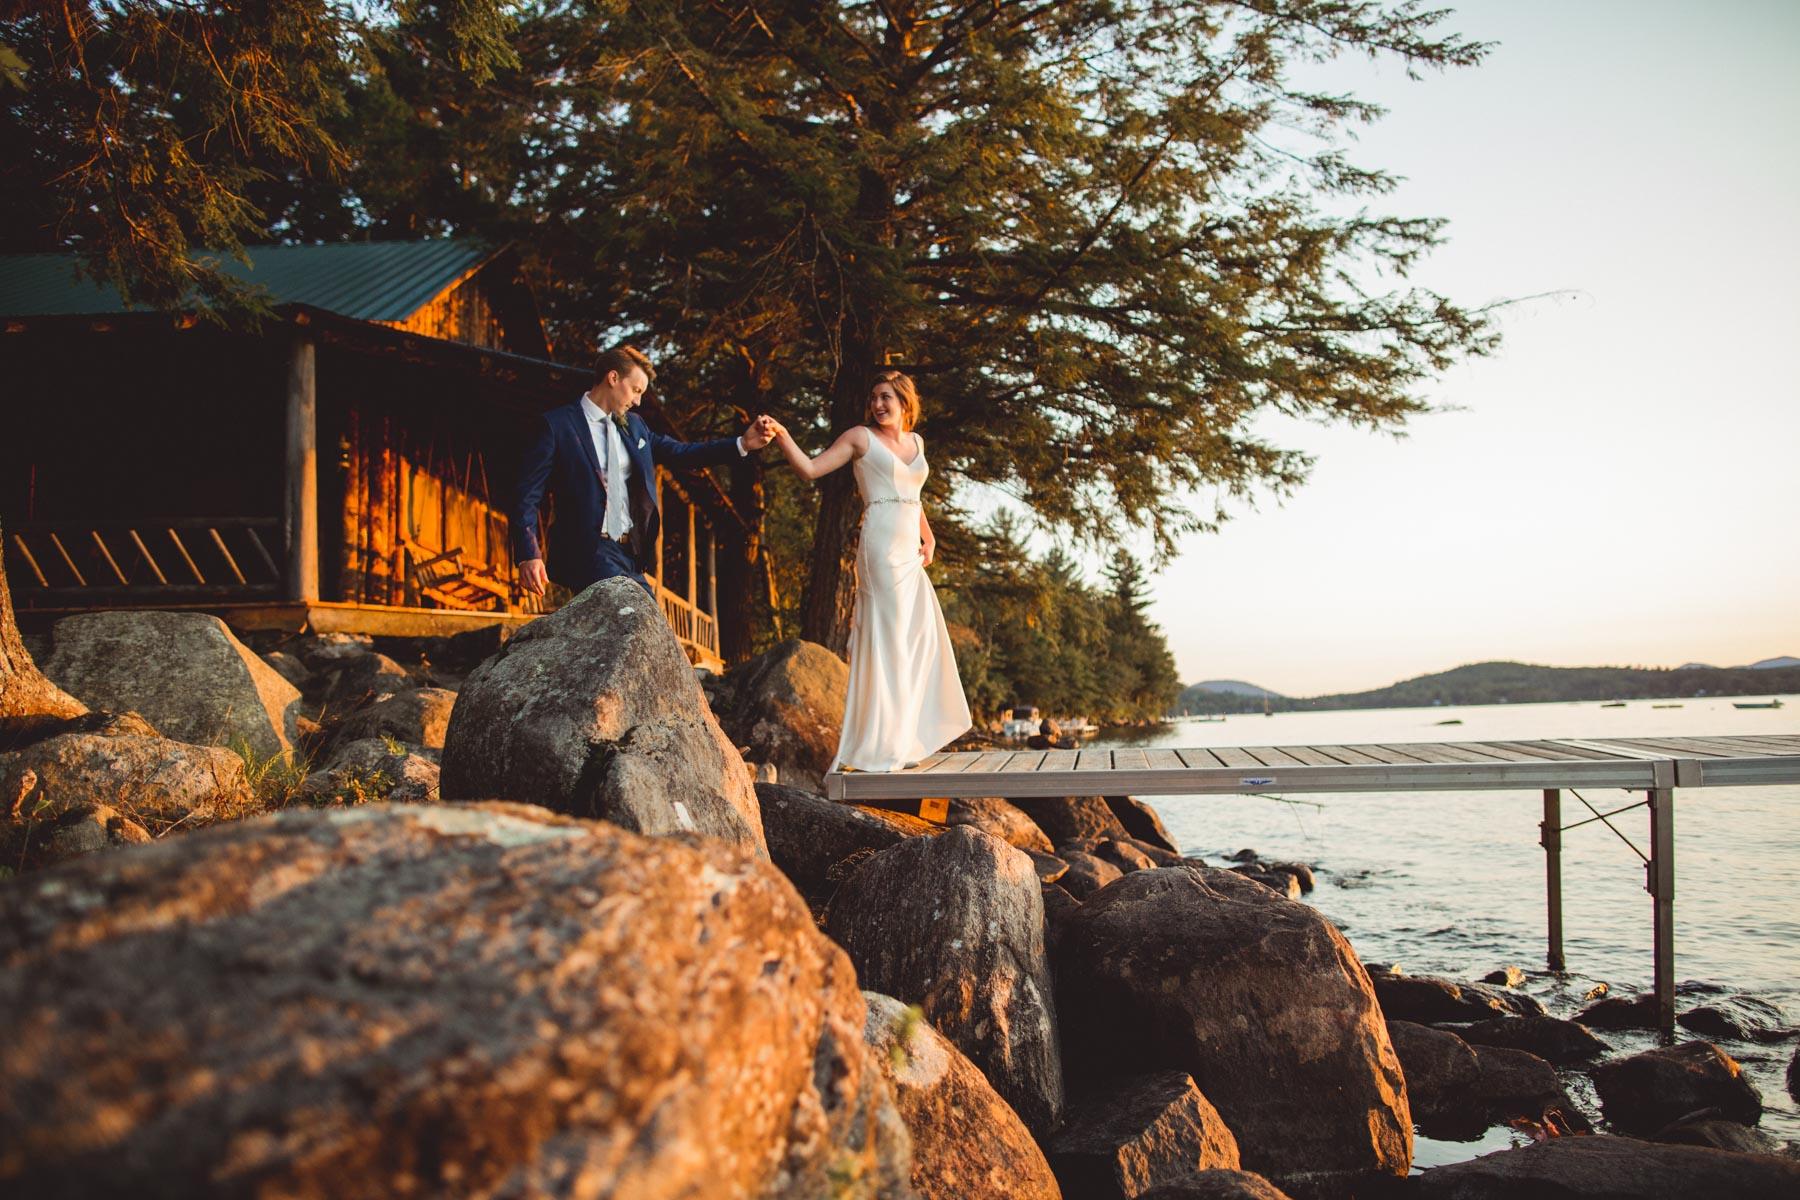 Wedding-Photography-Campground-22.jpg